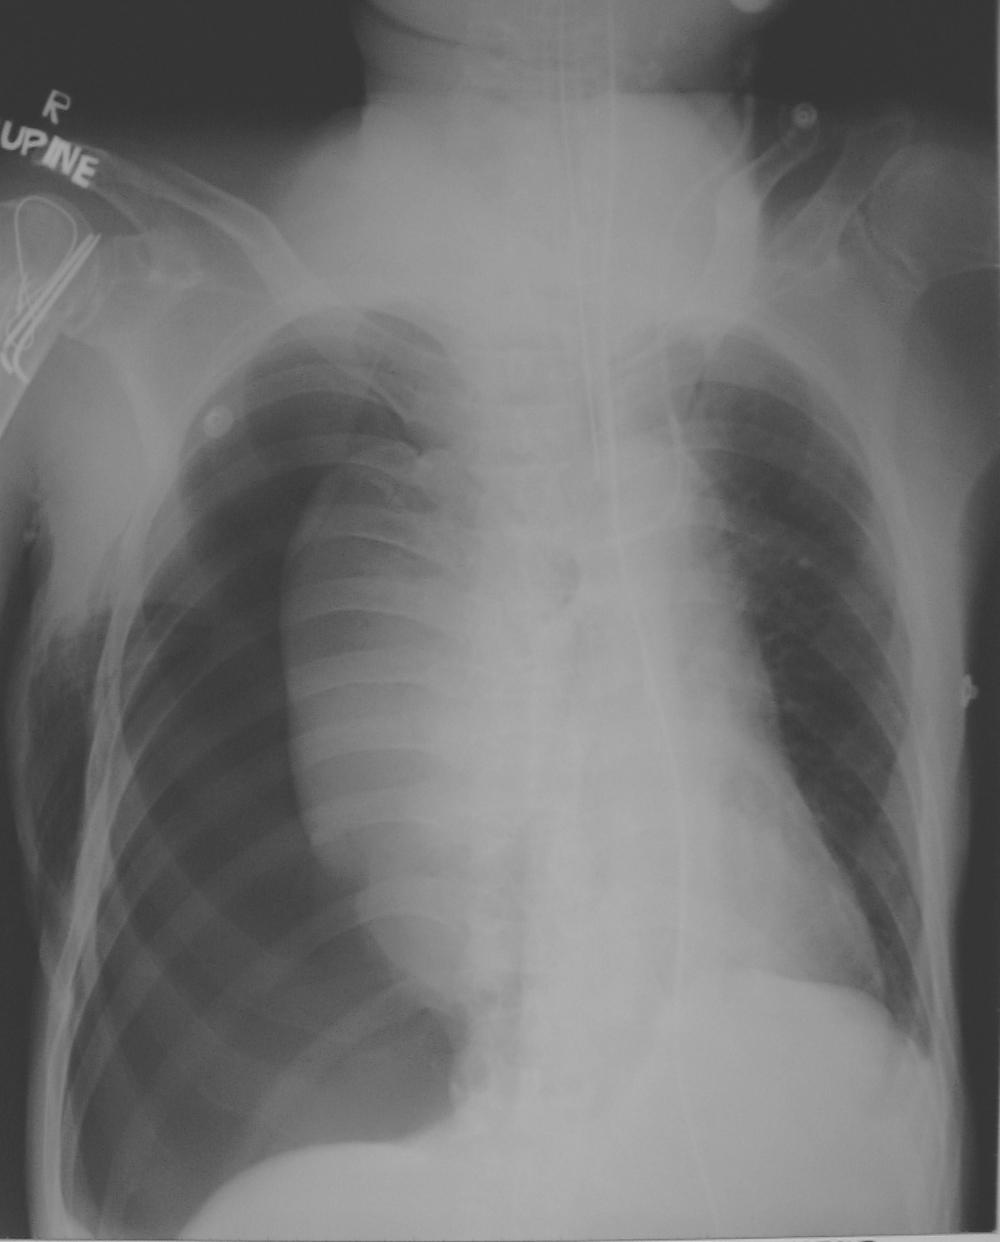 Pneumothorax   X-ray (severe) 1